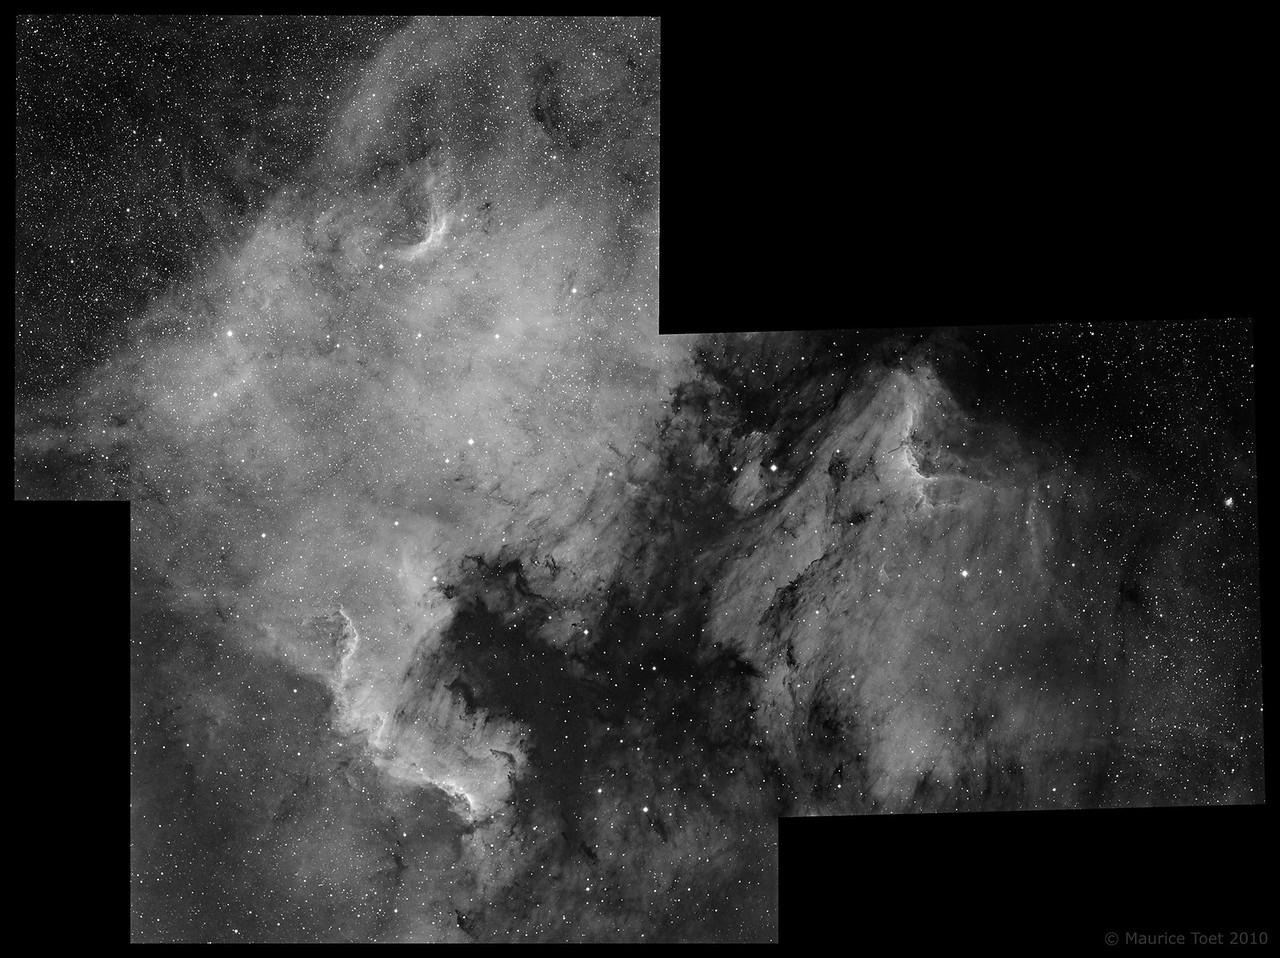 NGC 7000 & IC 5070, North America and Pelican Nebula